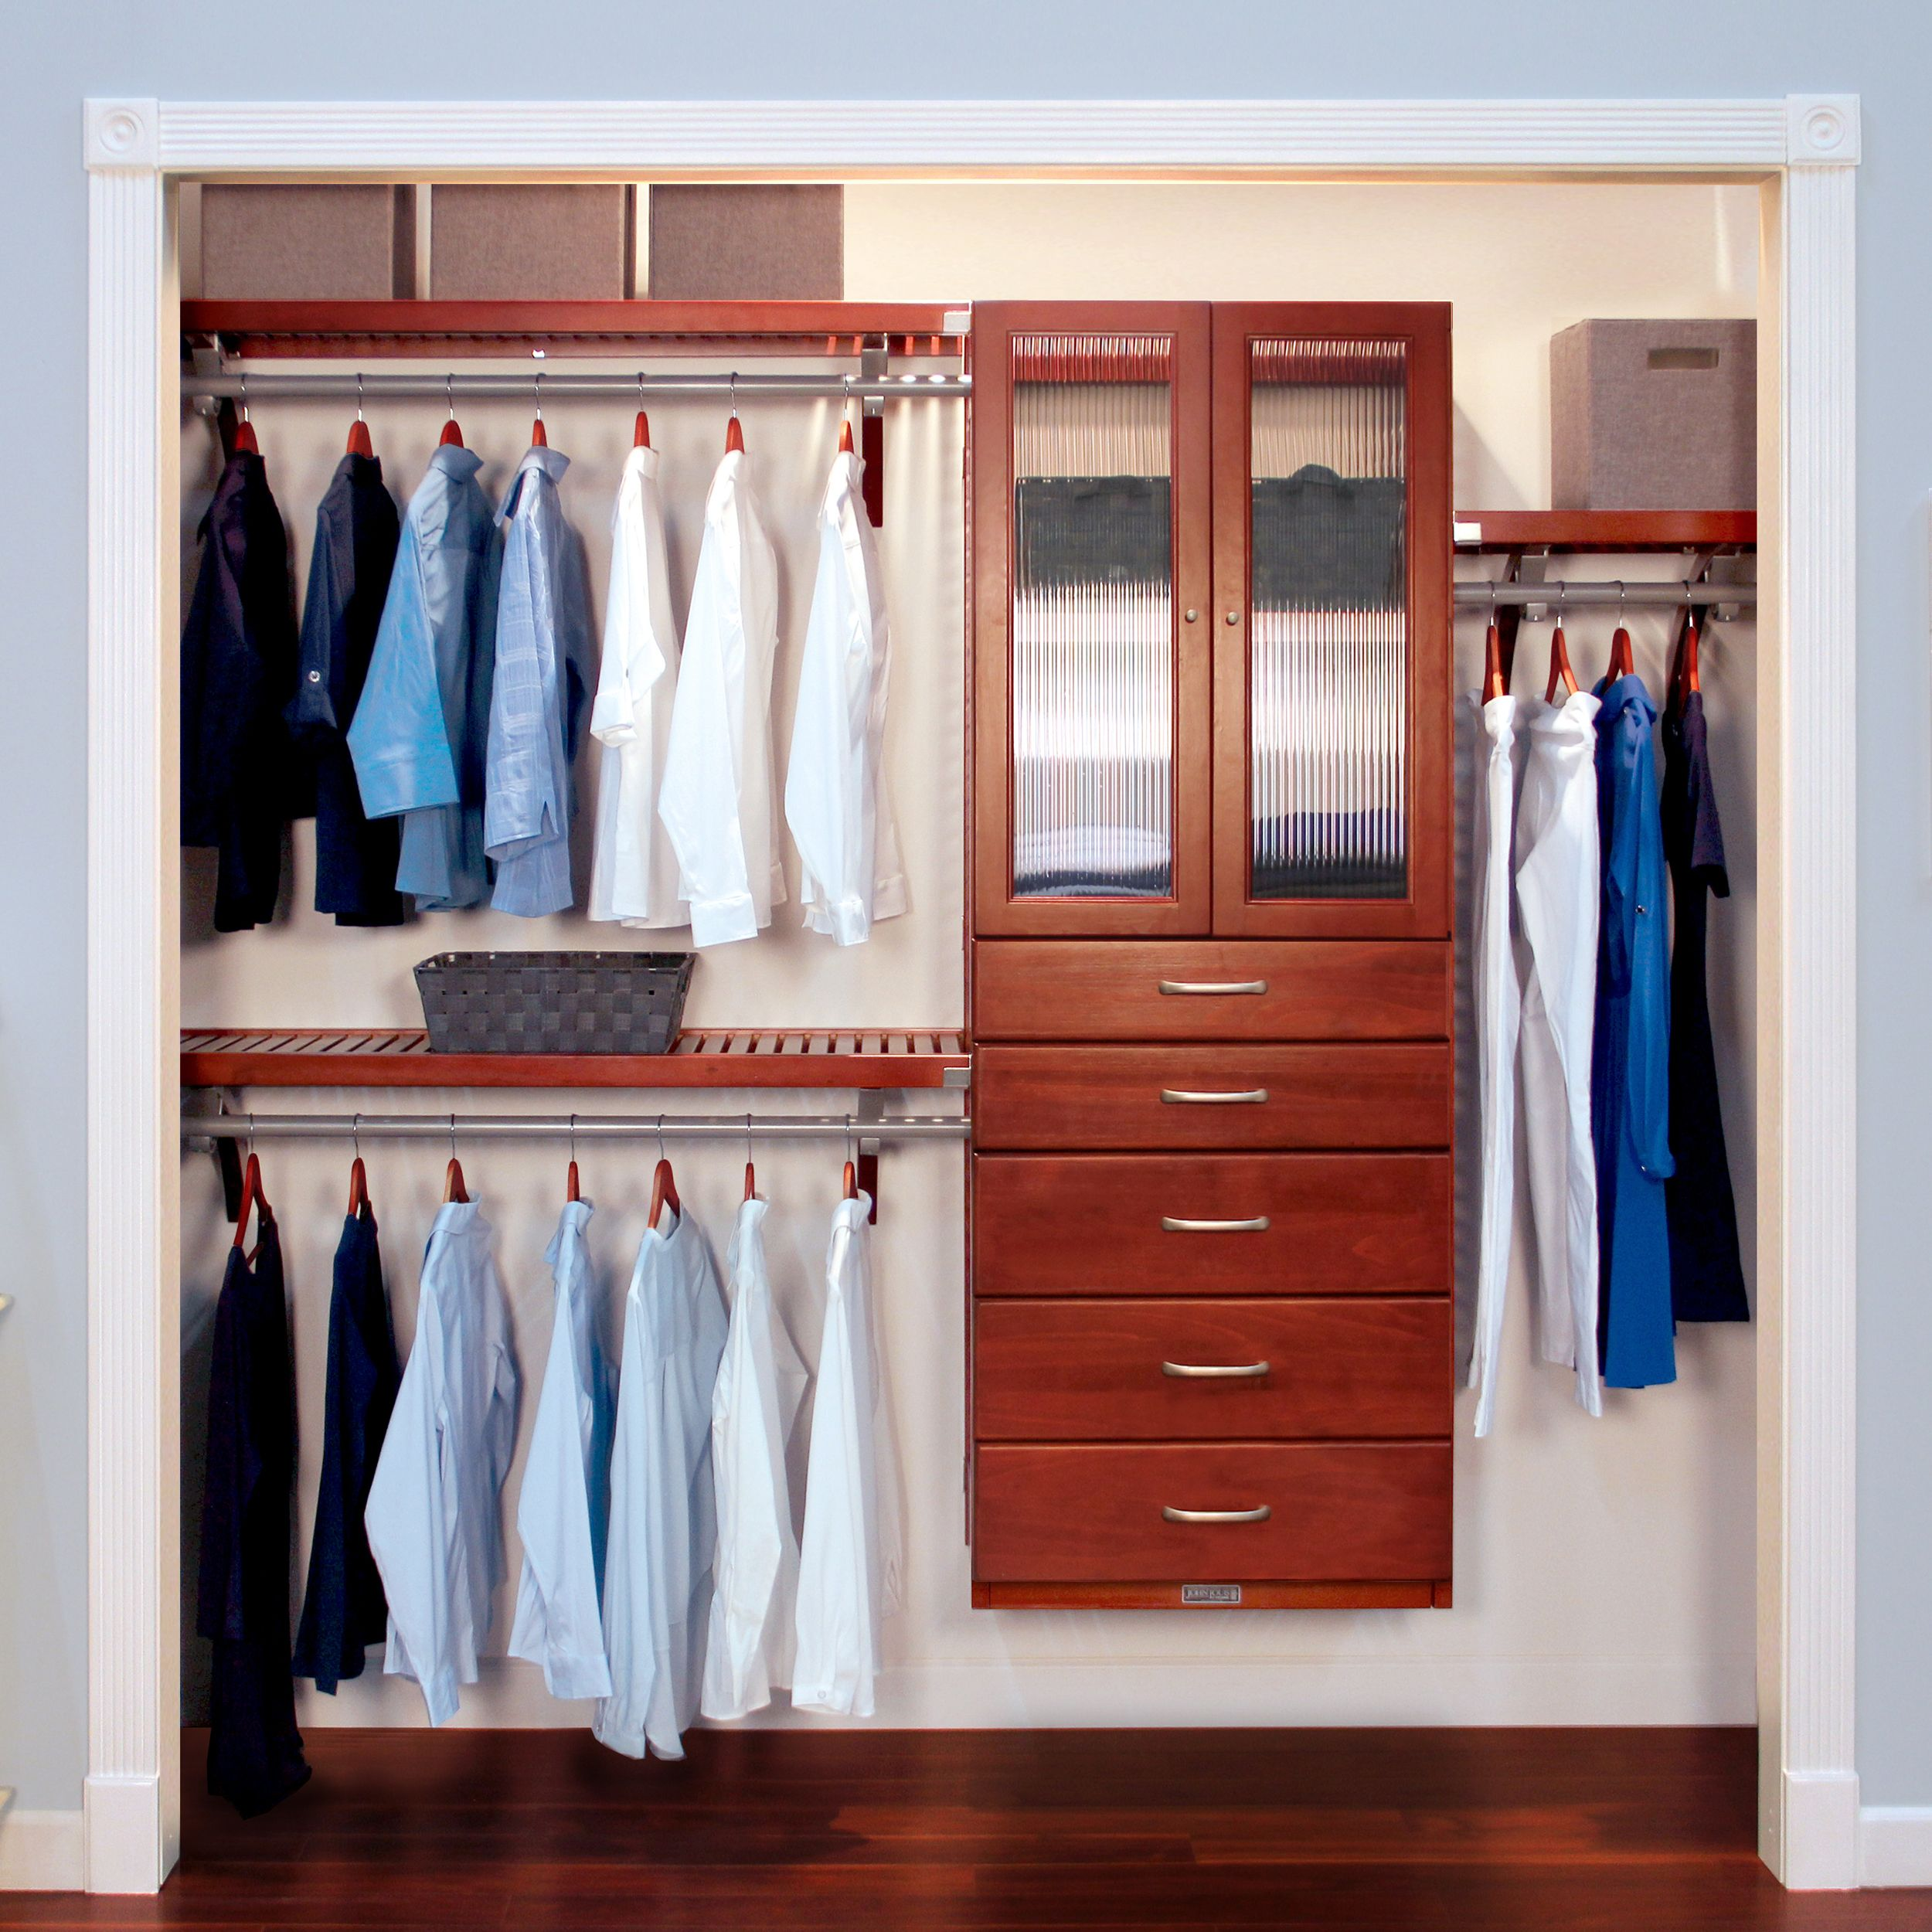 16in deep deluxe organizer 5 drawers 6 8in deep